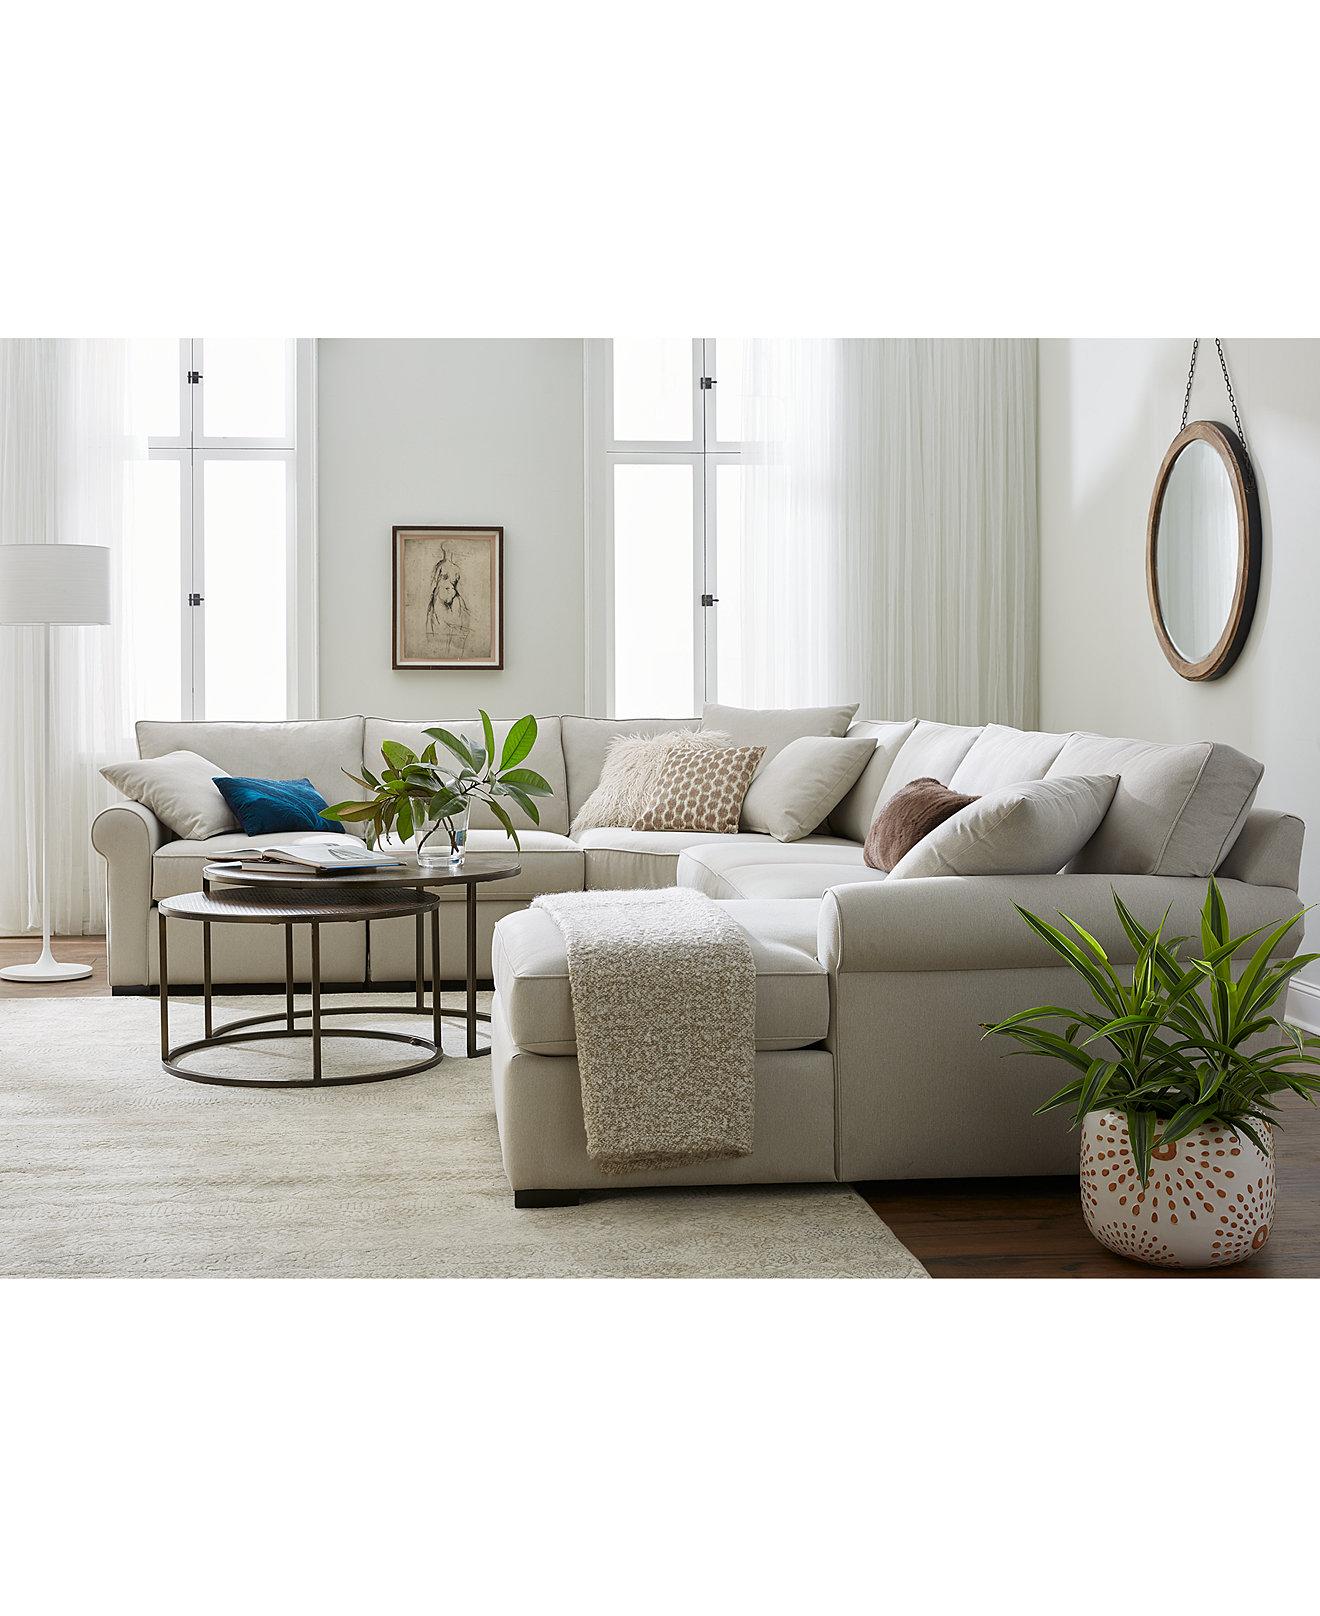 Macys Furn: Macys Living Room Sets